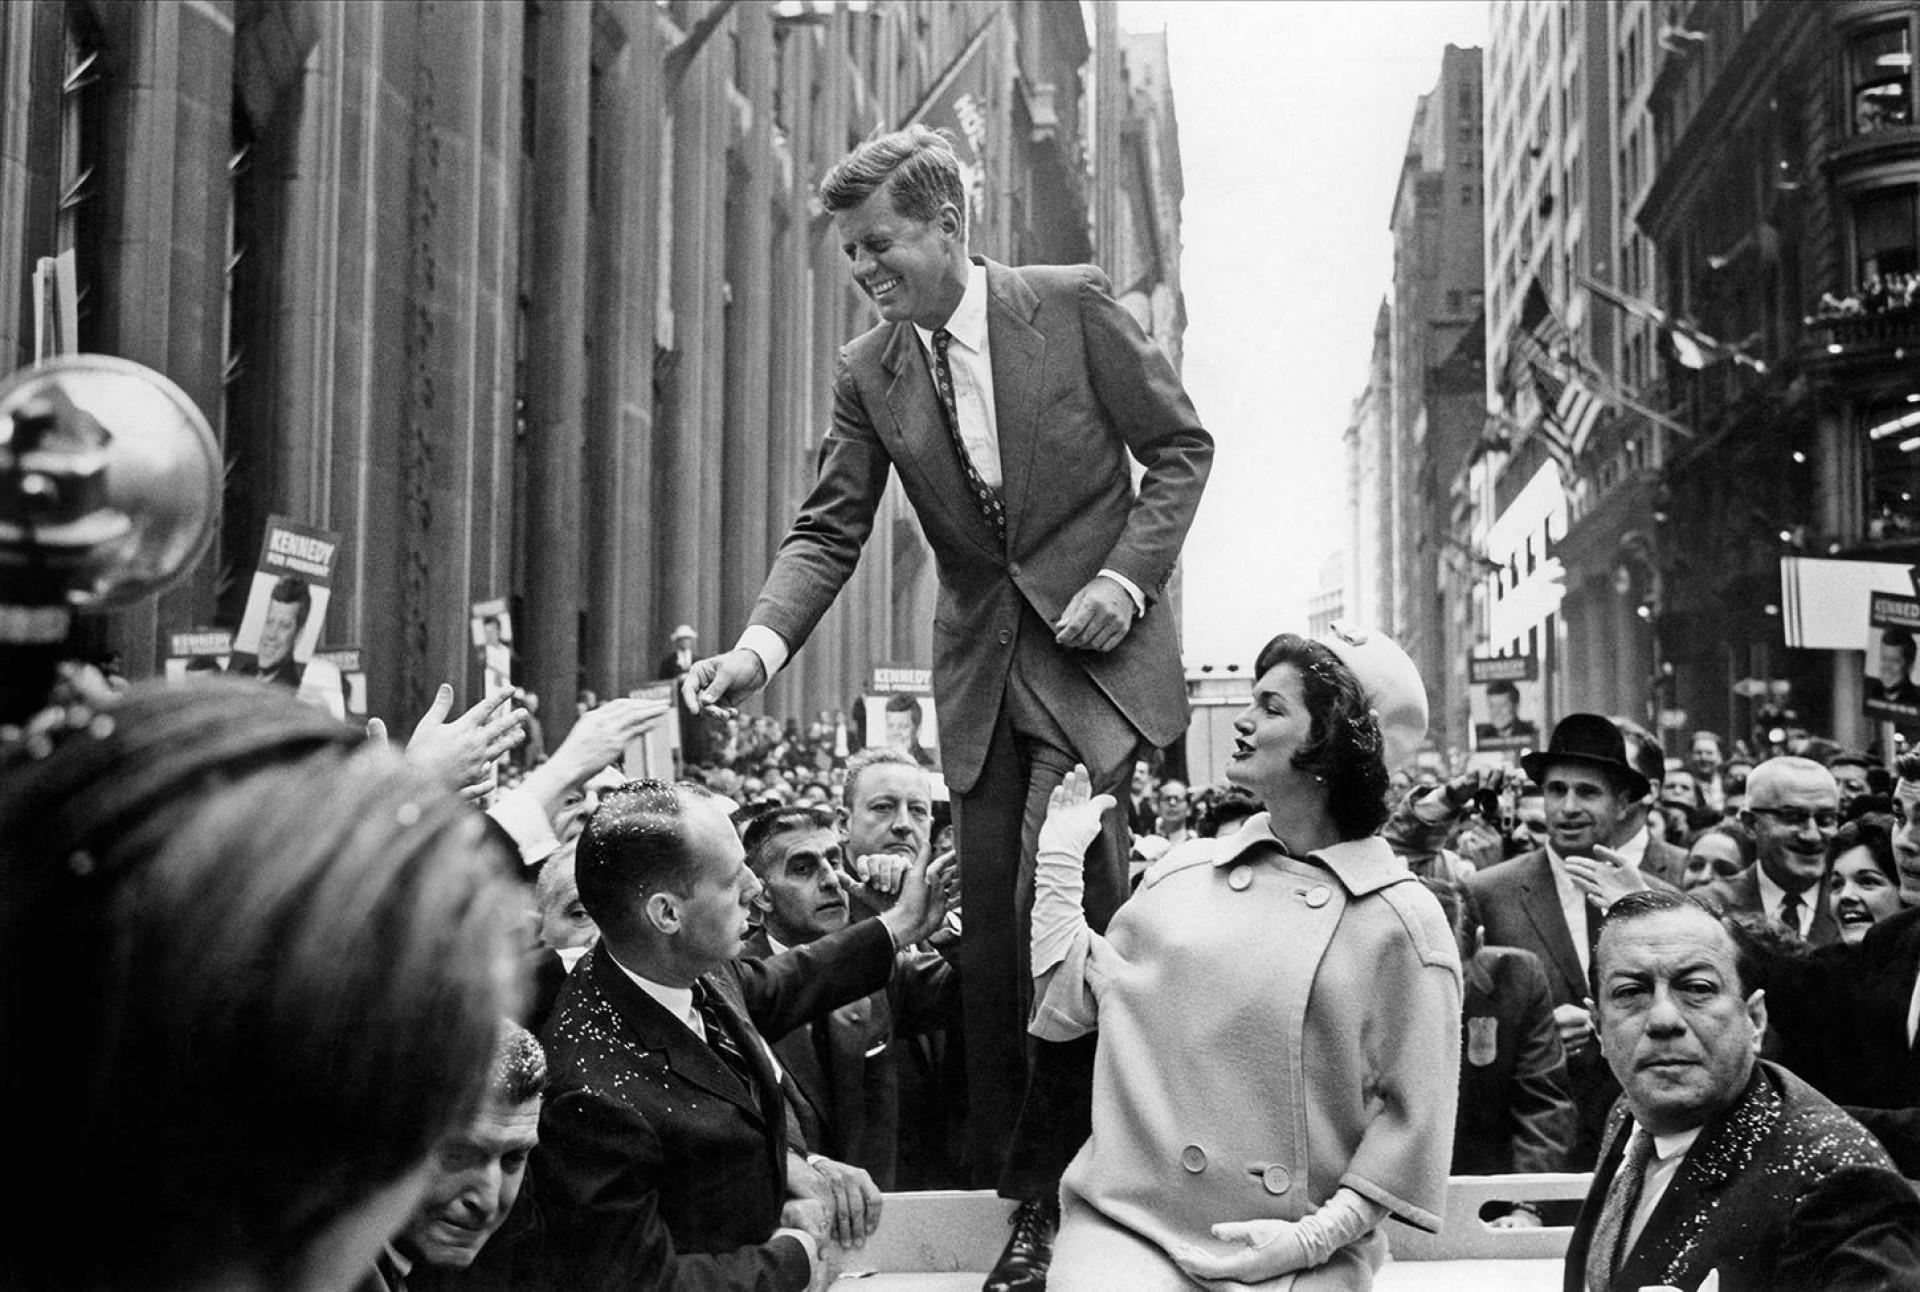 John F. Kennedy campaigning